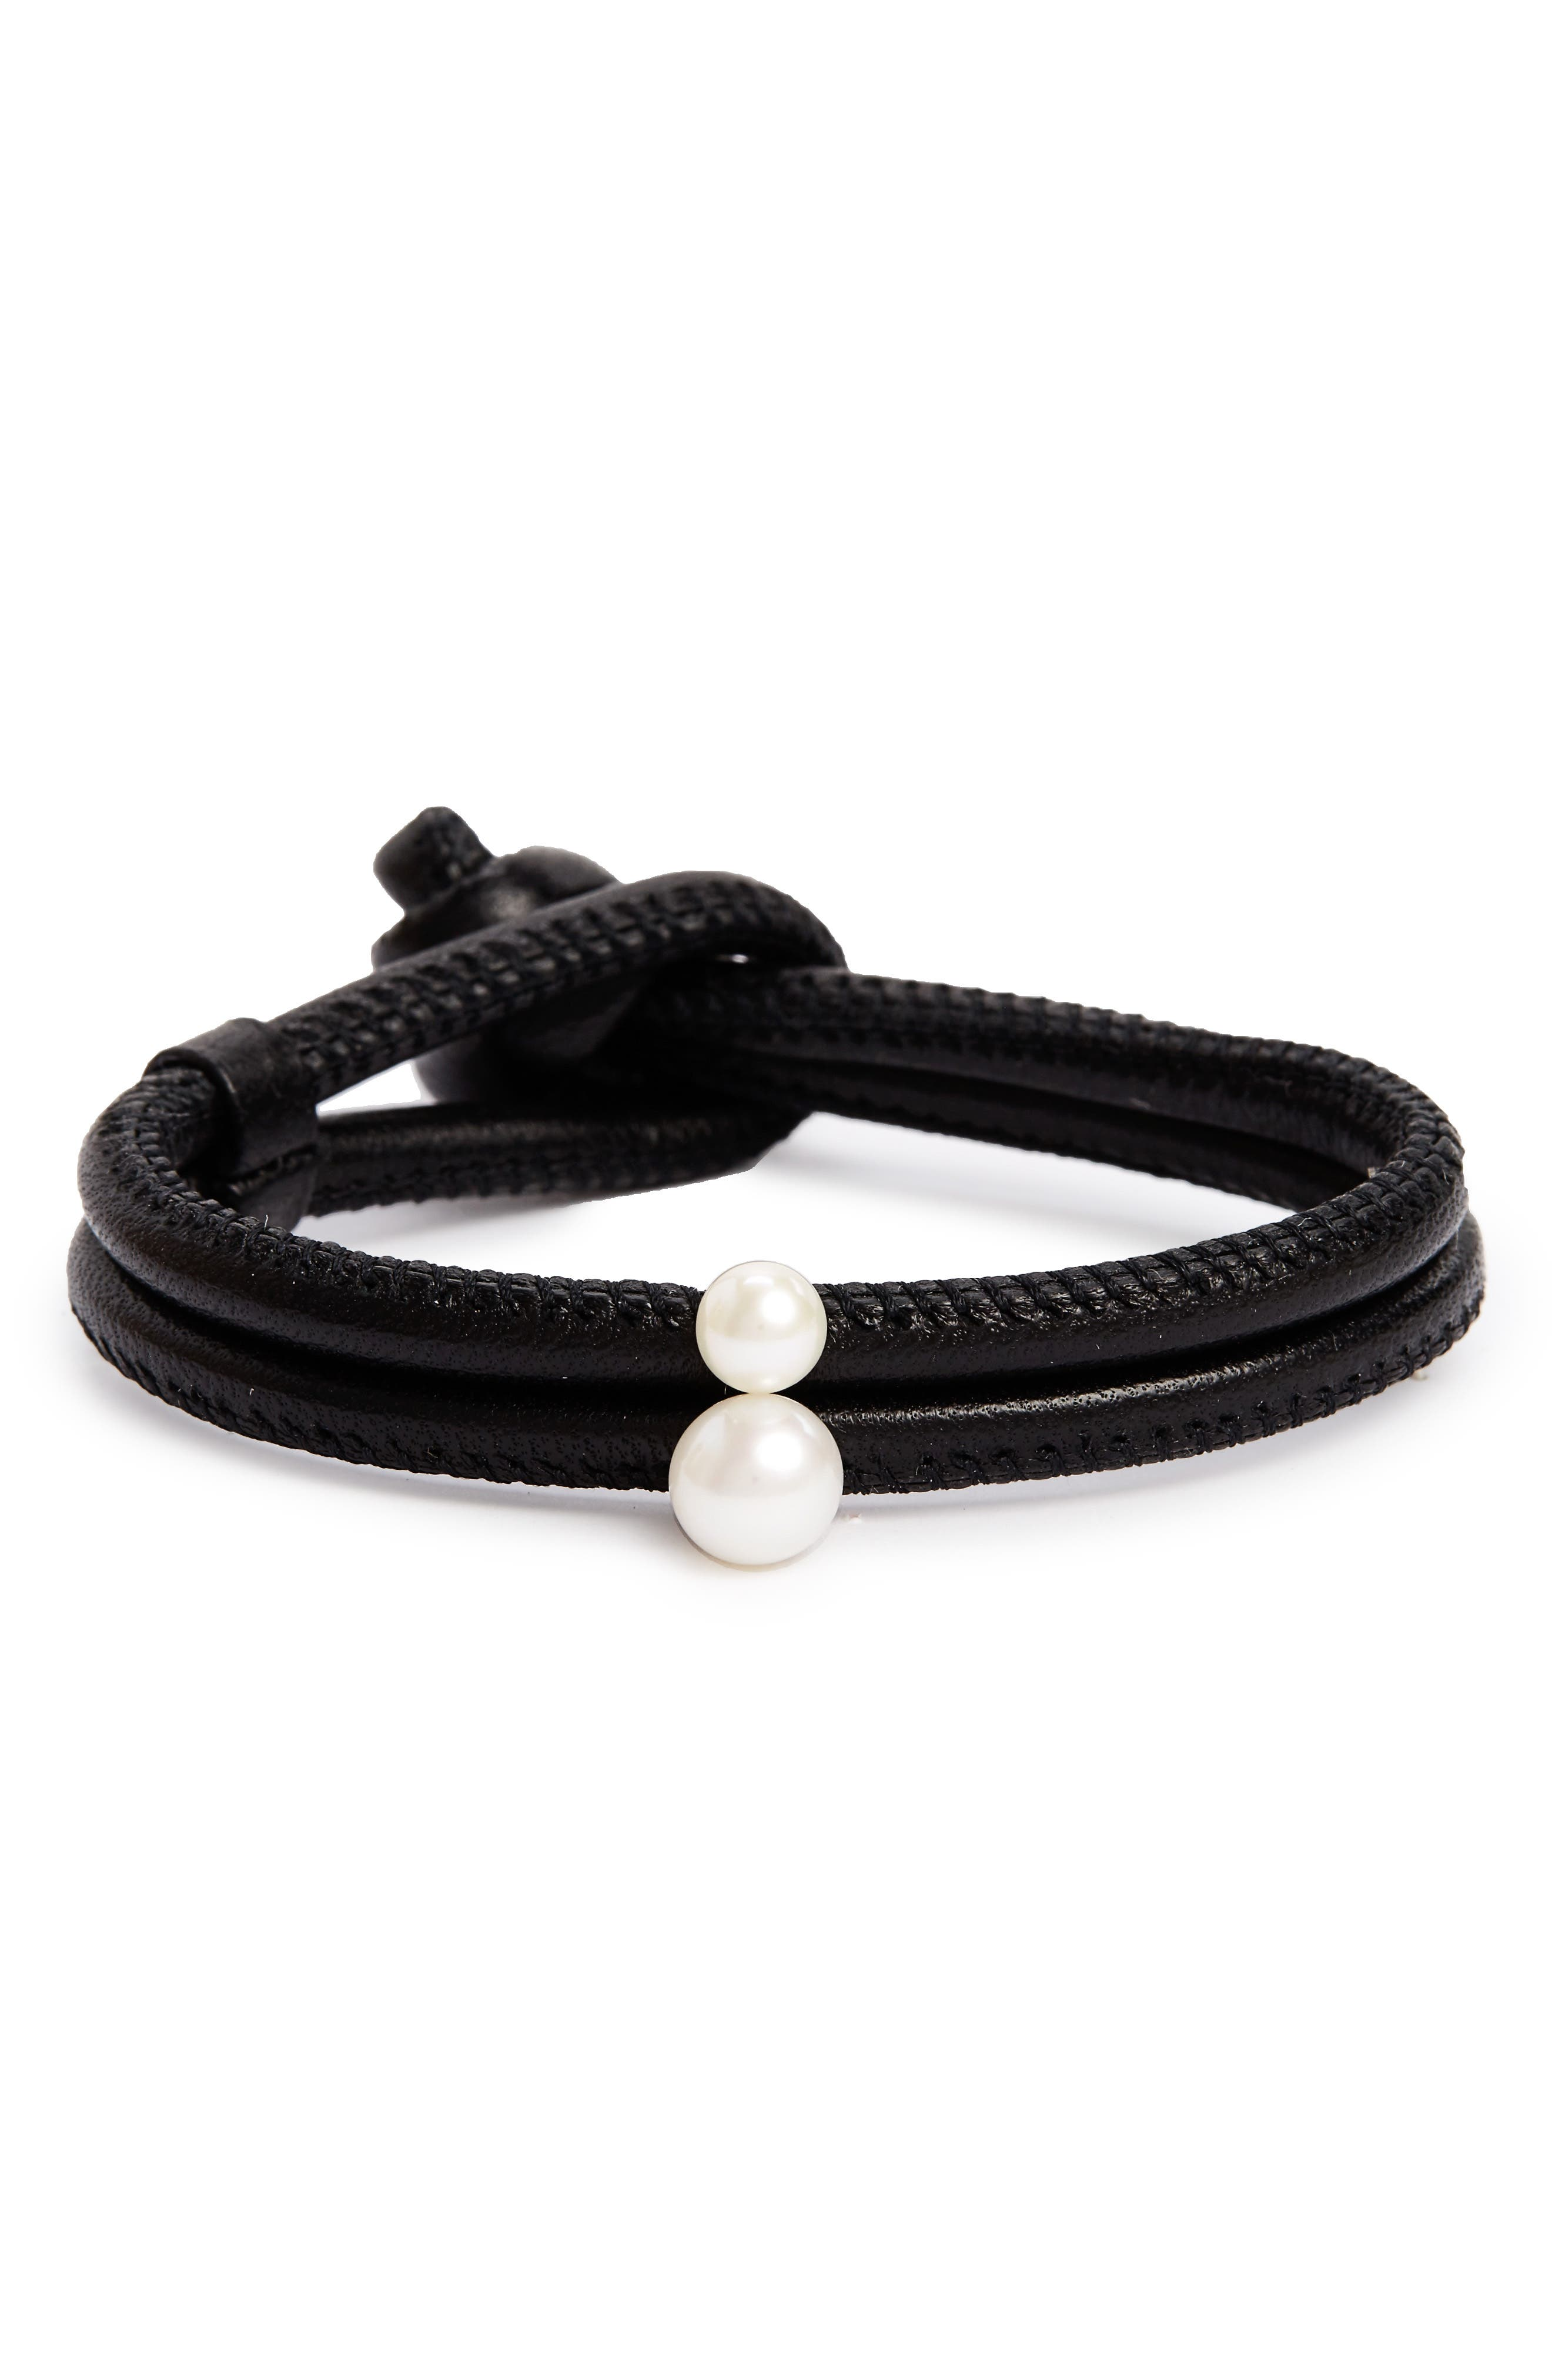 Alternate Image 1 Selected - Mizuki Leather & Akoya Pearl Bracelet